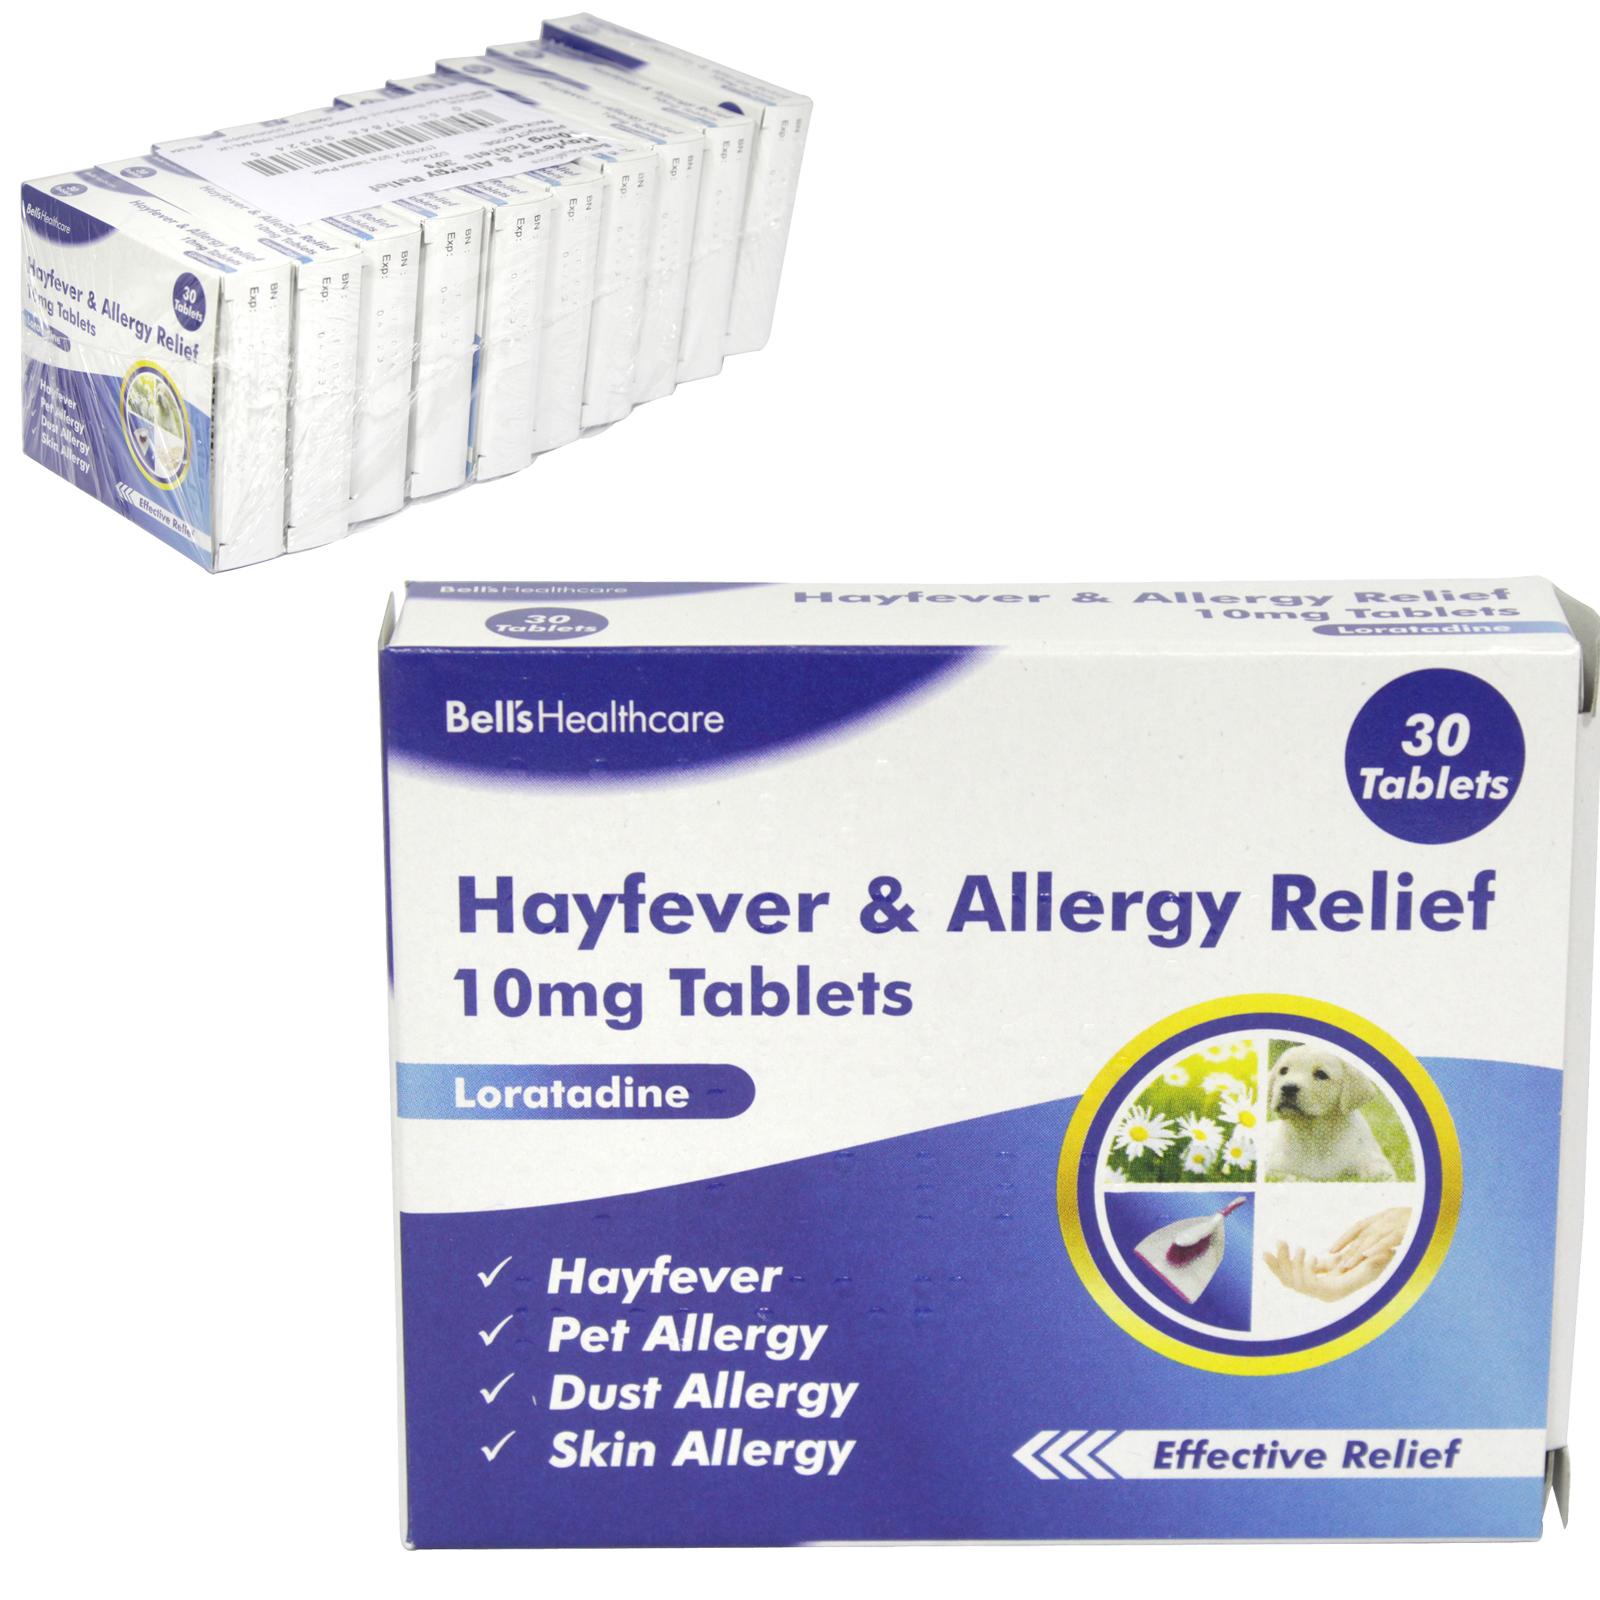 HAYFEVER+ALLERGY OAD 30S LORATADINE X10 (NON RETURNABLE)